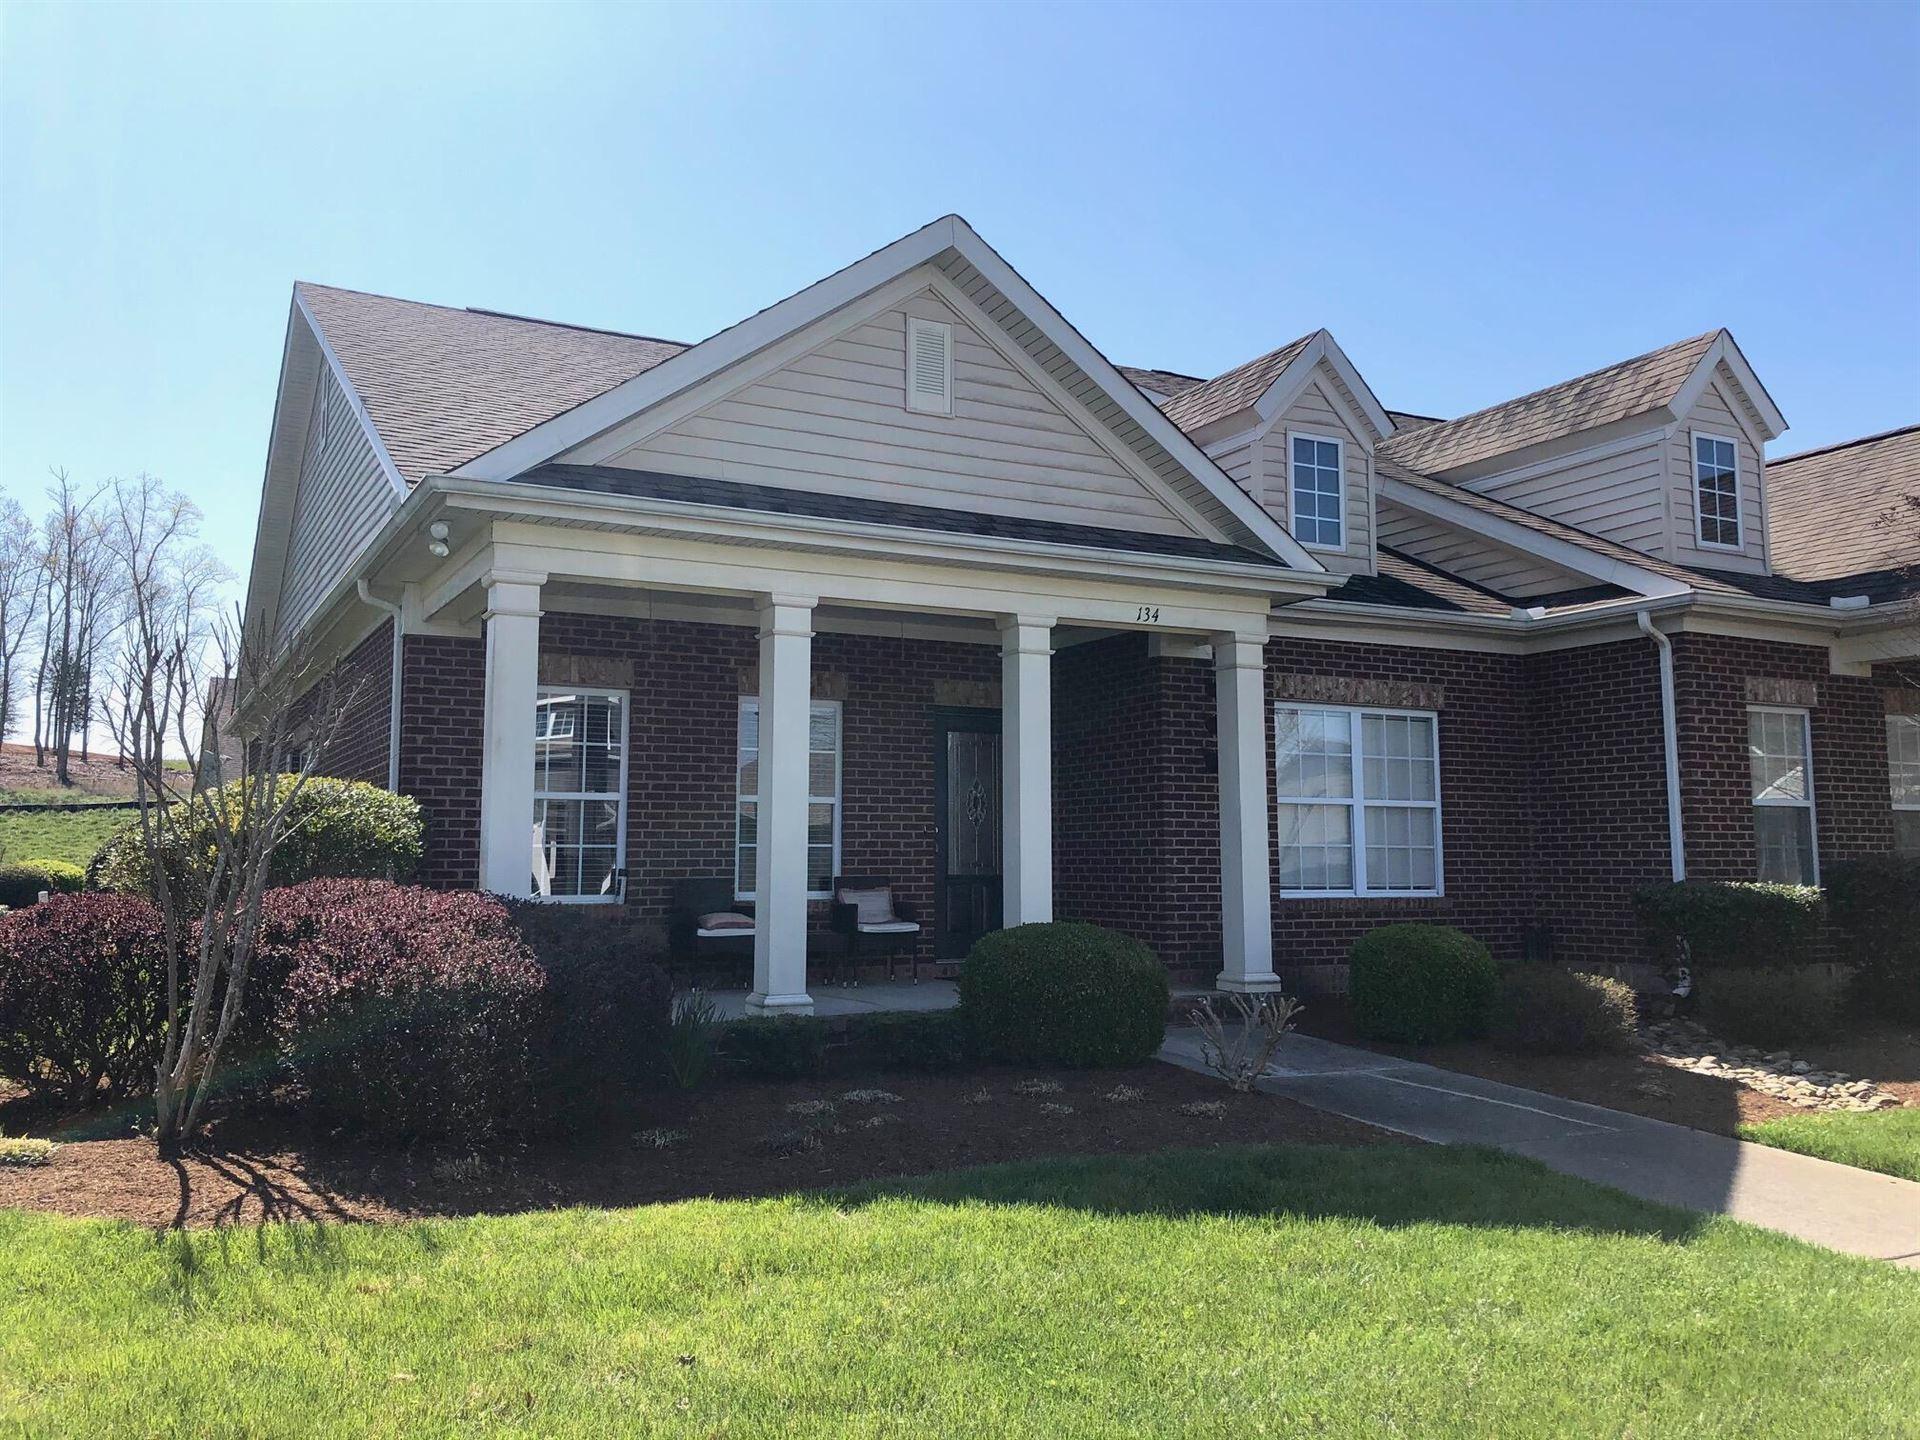 Photo of 134 Hardinberry St, Oak Ridge, TN 37830 (MLS # 1148107)